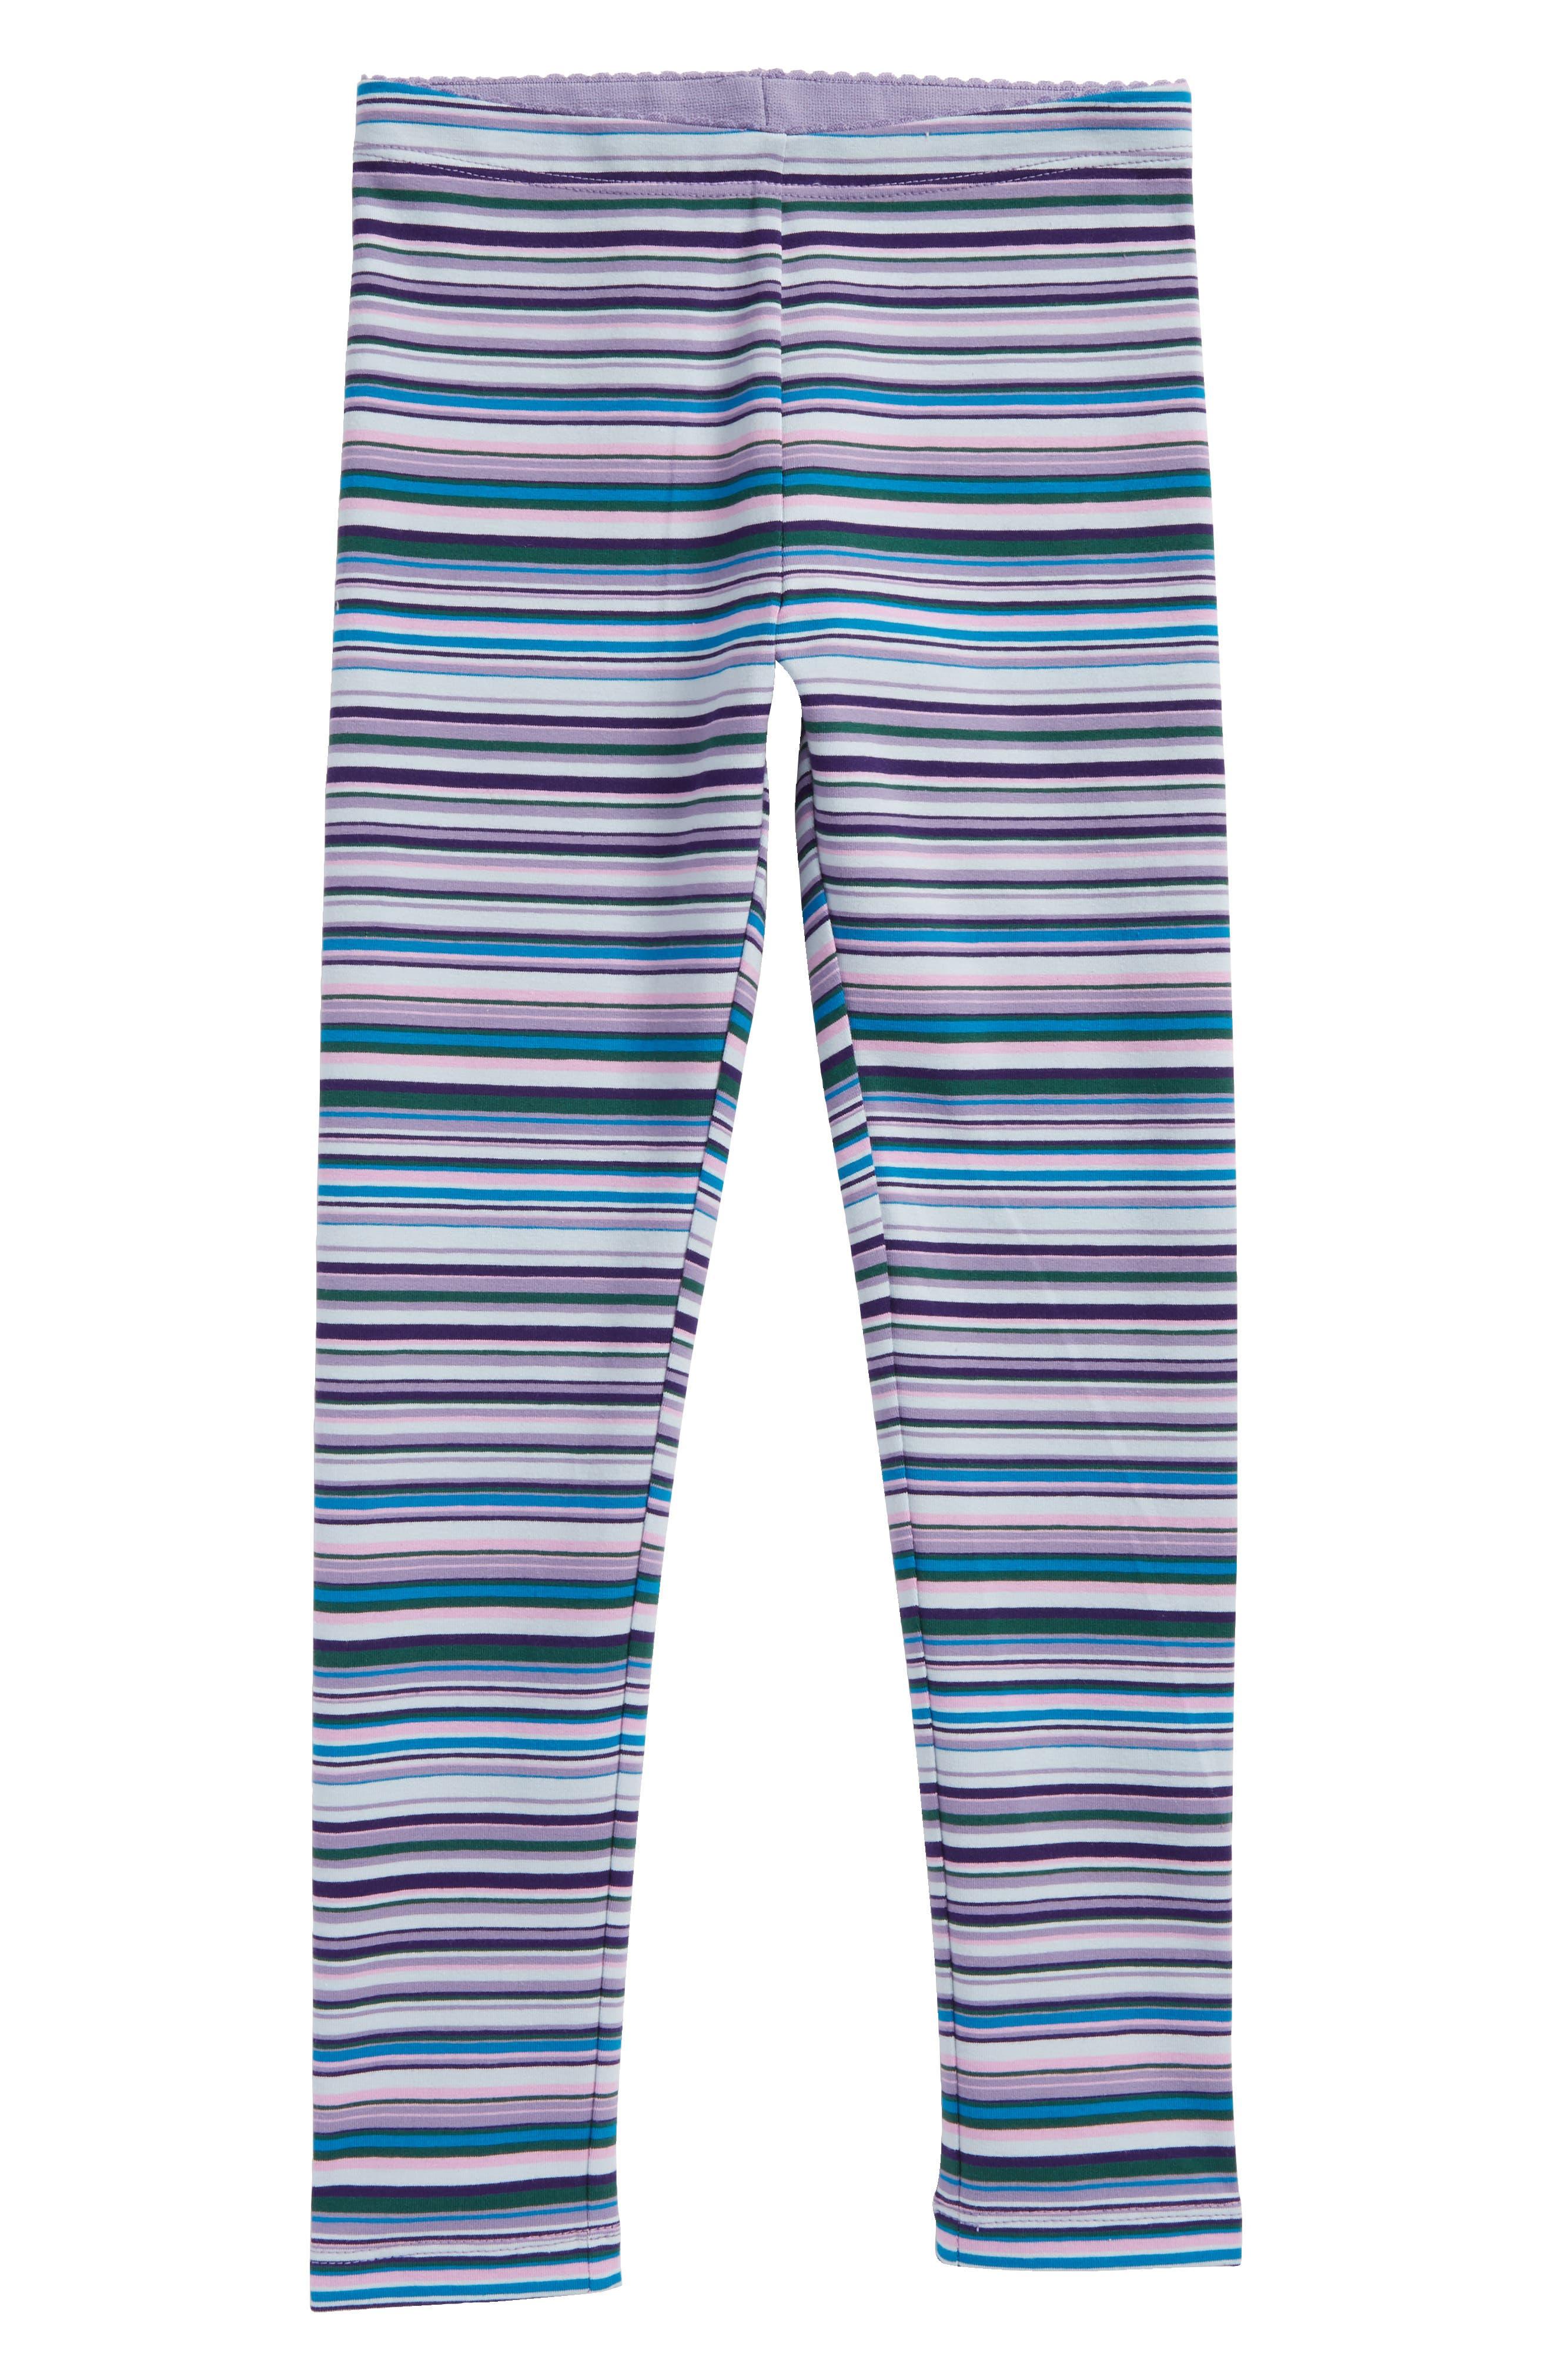 Tea Collection Multistripe Leggings (Toddler Girls, Little Girls & Big Girls)